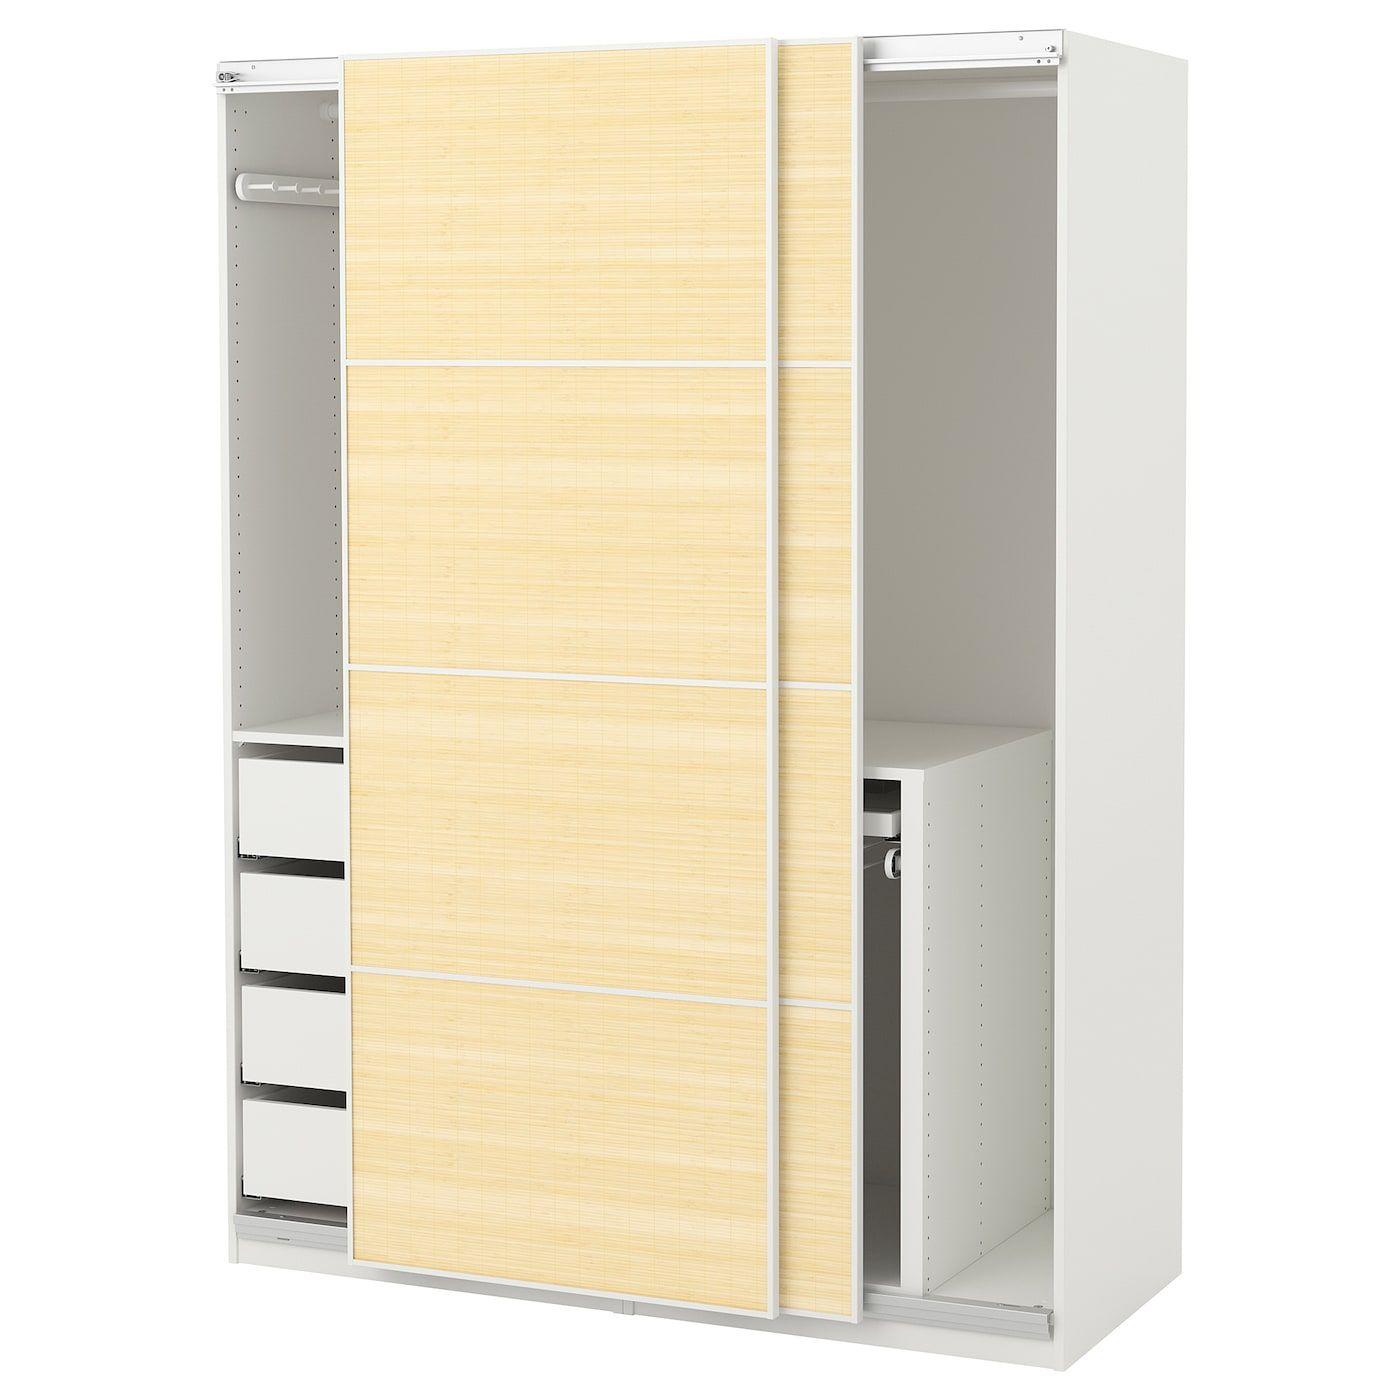 Furniture And Home Furnishings Pax Wardrobe Ikea Pax Ikea Pax